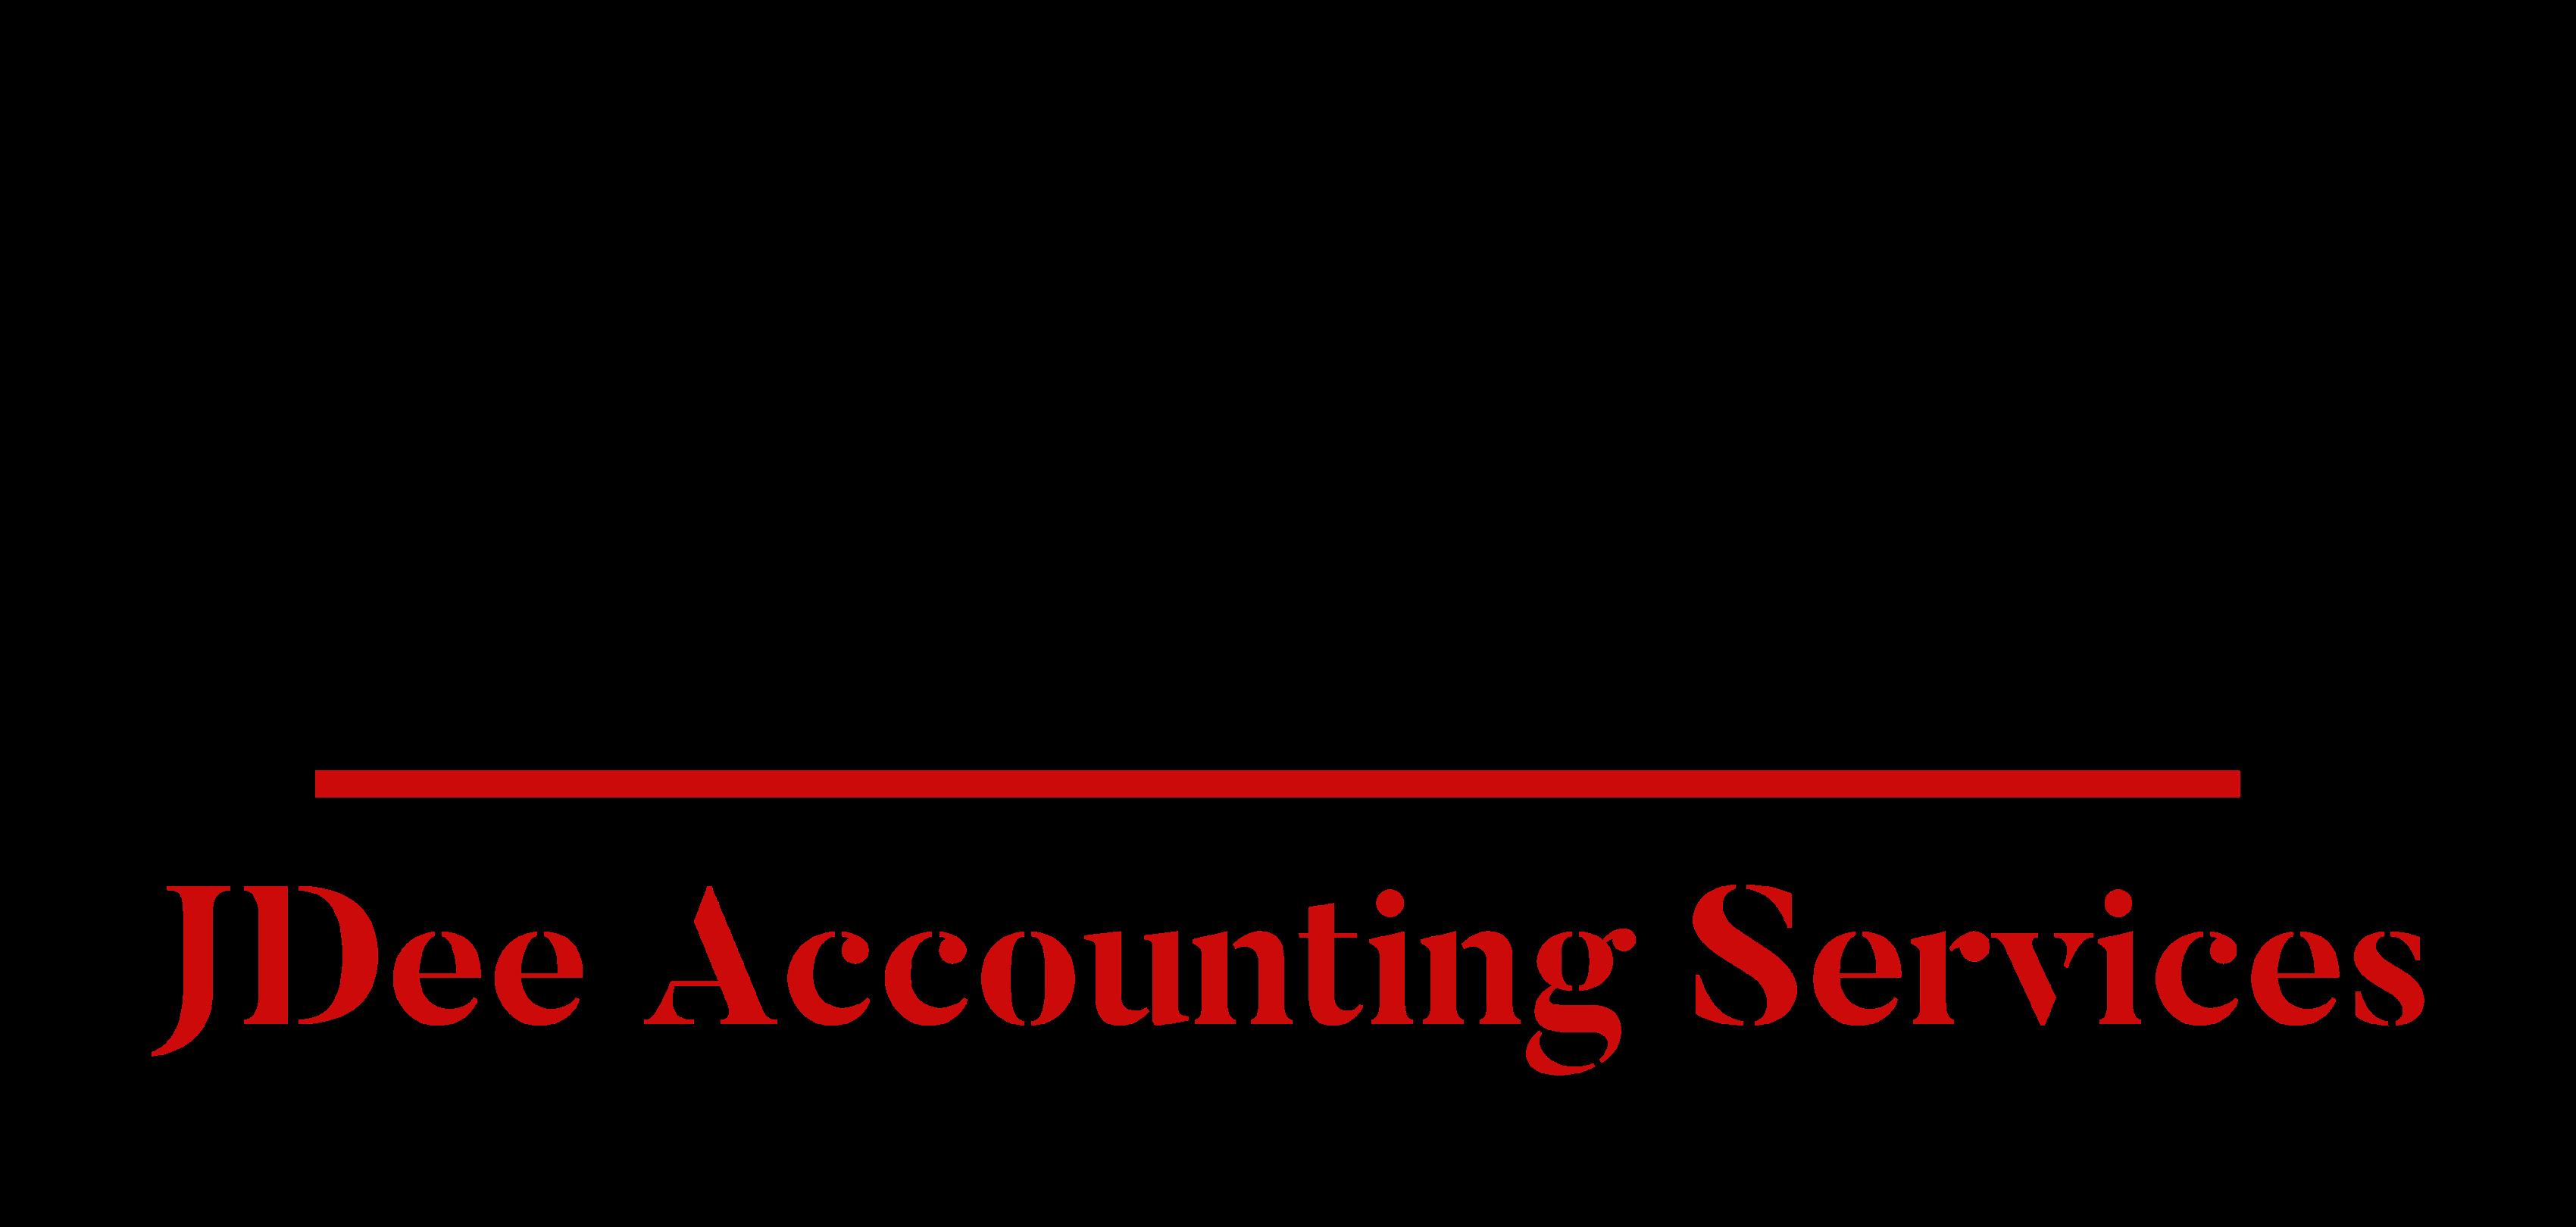 JDee Accounting